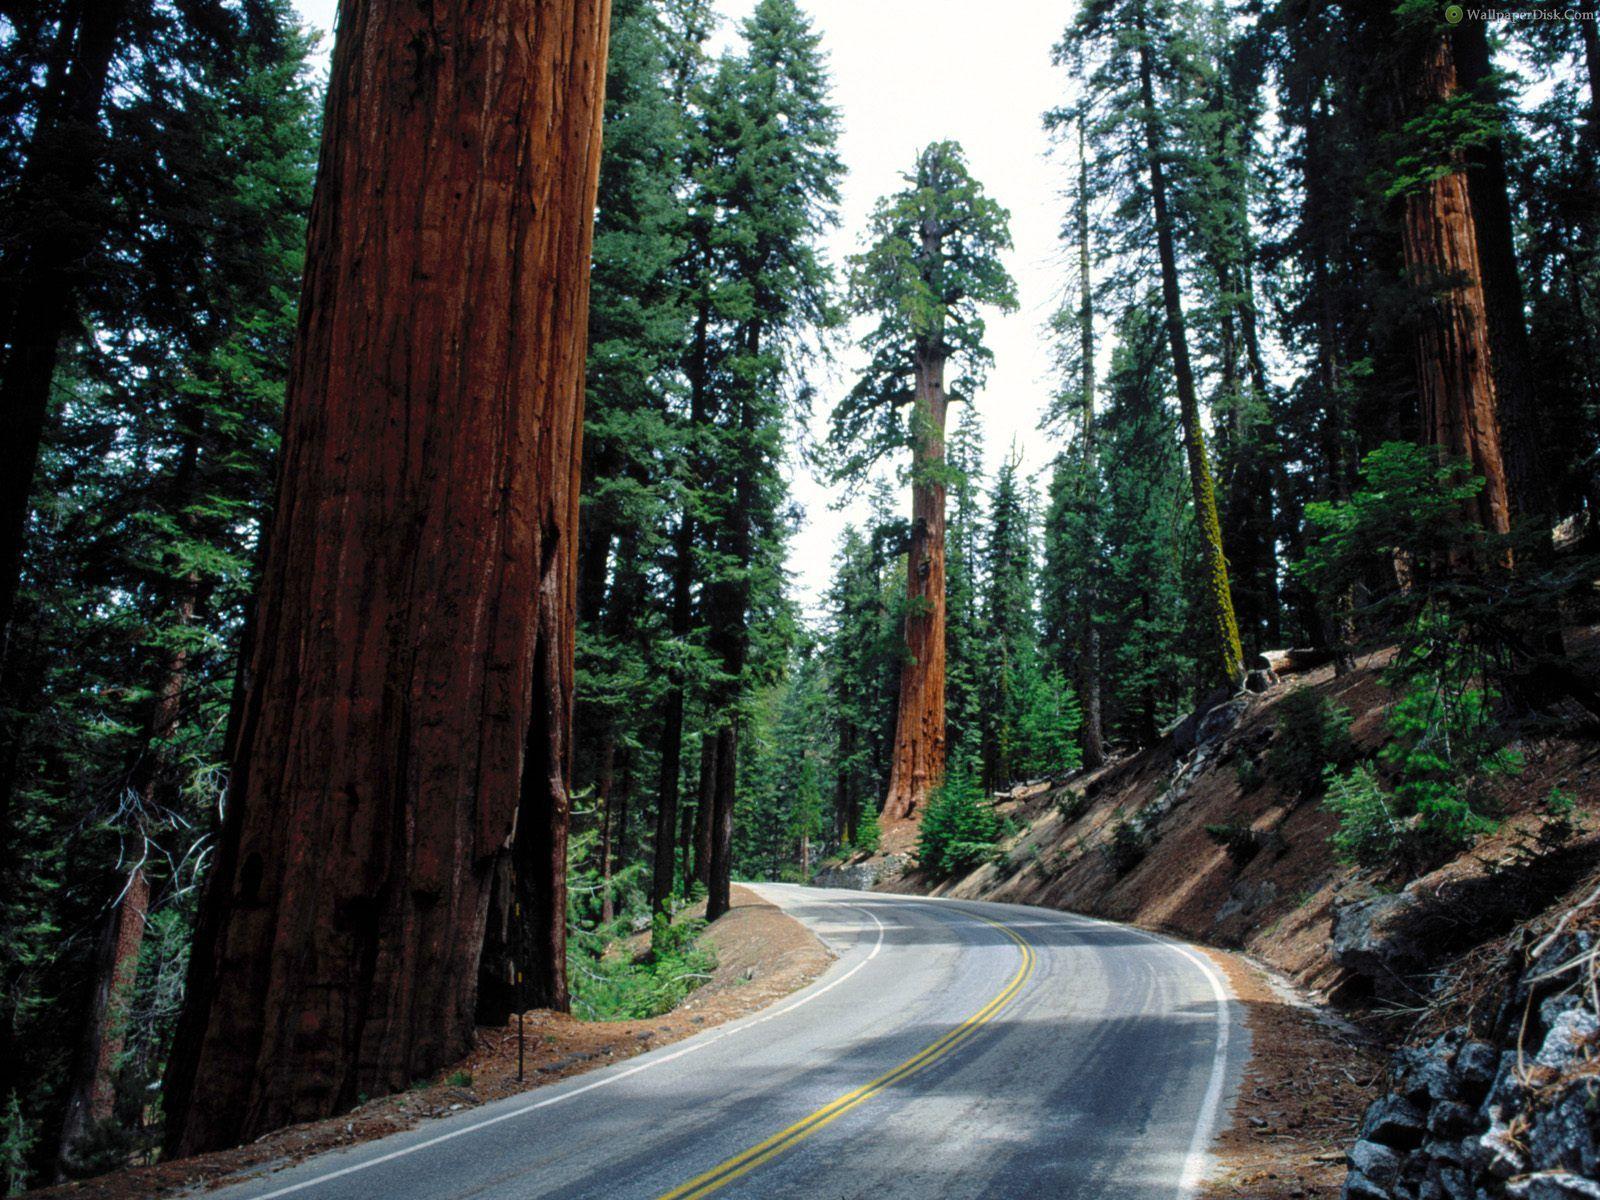 Download Redwood Road Sequoia National Park Wallpaper 1600x1200